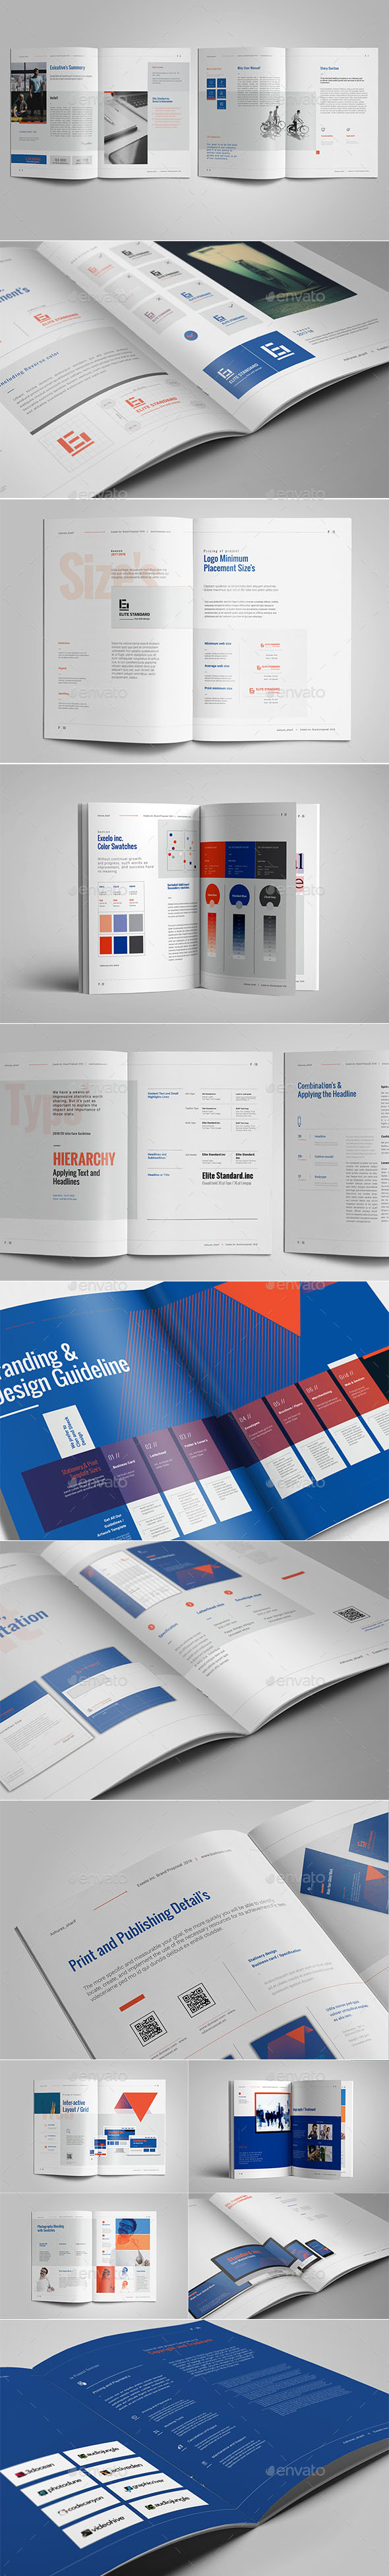 40+ Best Brand Guideline Templates (PSD, InDesign) | Premium Download